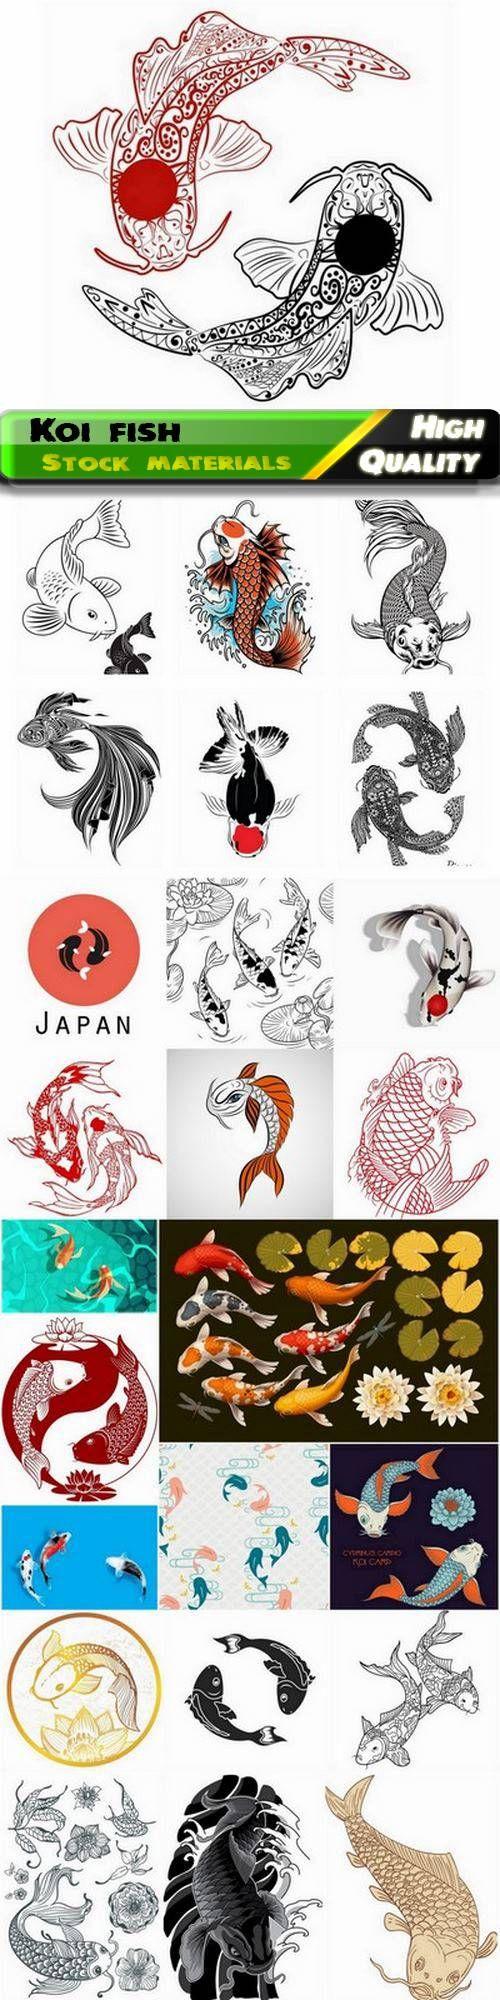 Decorative koi fish and brocade carp animals of japan 25 Eps